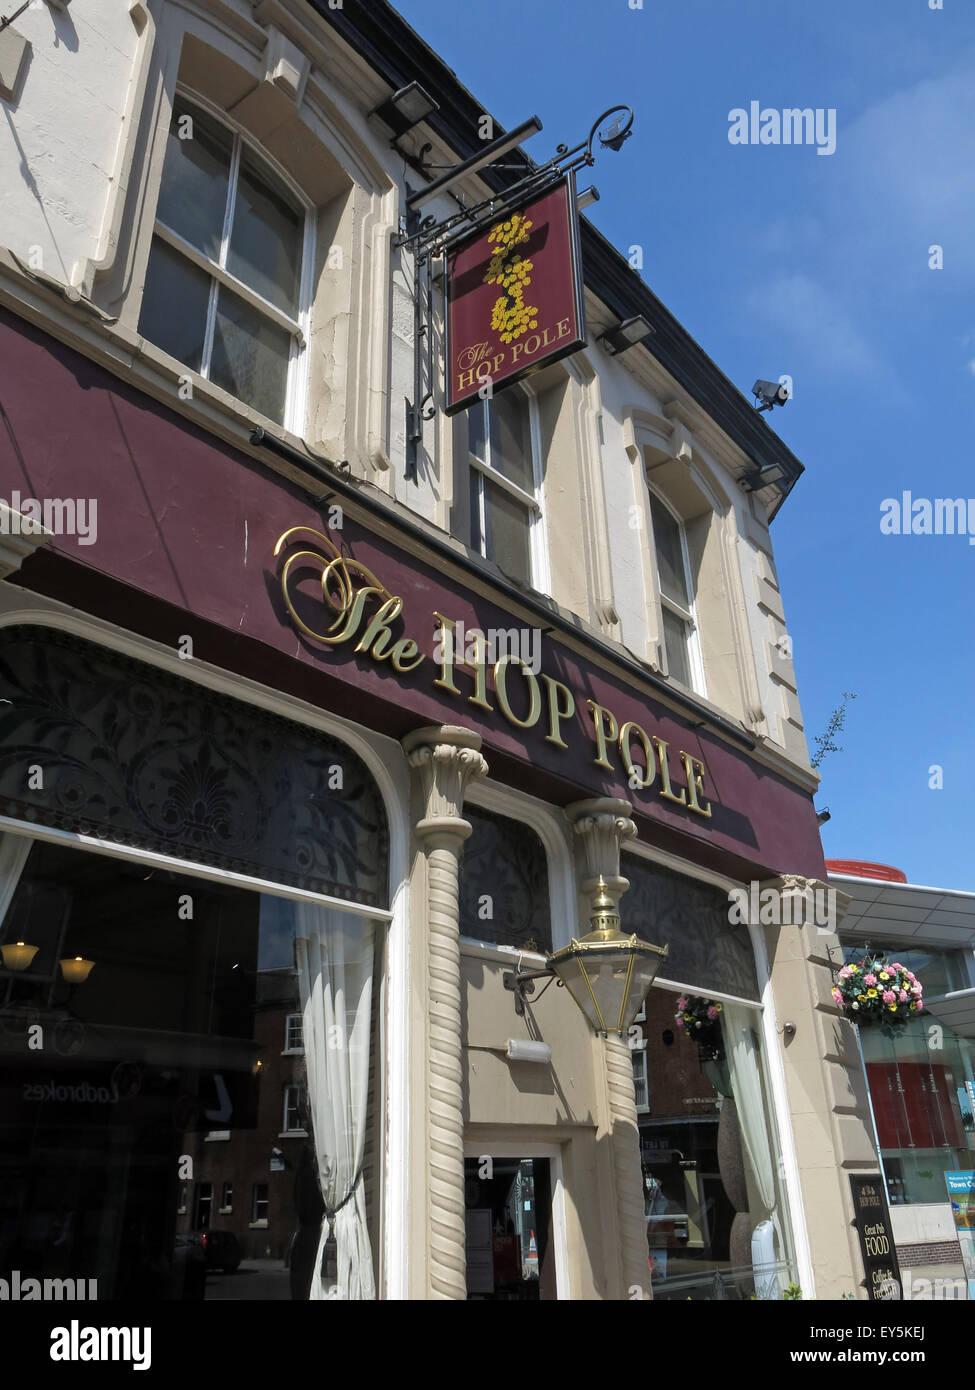 Laden Sie dieses Alamy Stockfoto Die Hop-Pole Pub, 49 Horsemarket Street Warrington, Cheshire, England, UK WA1 1TS neben dem Busbahnhof - EY5KEJ